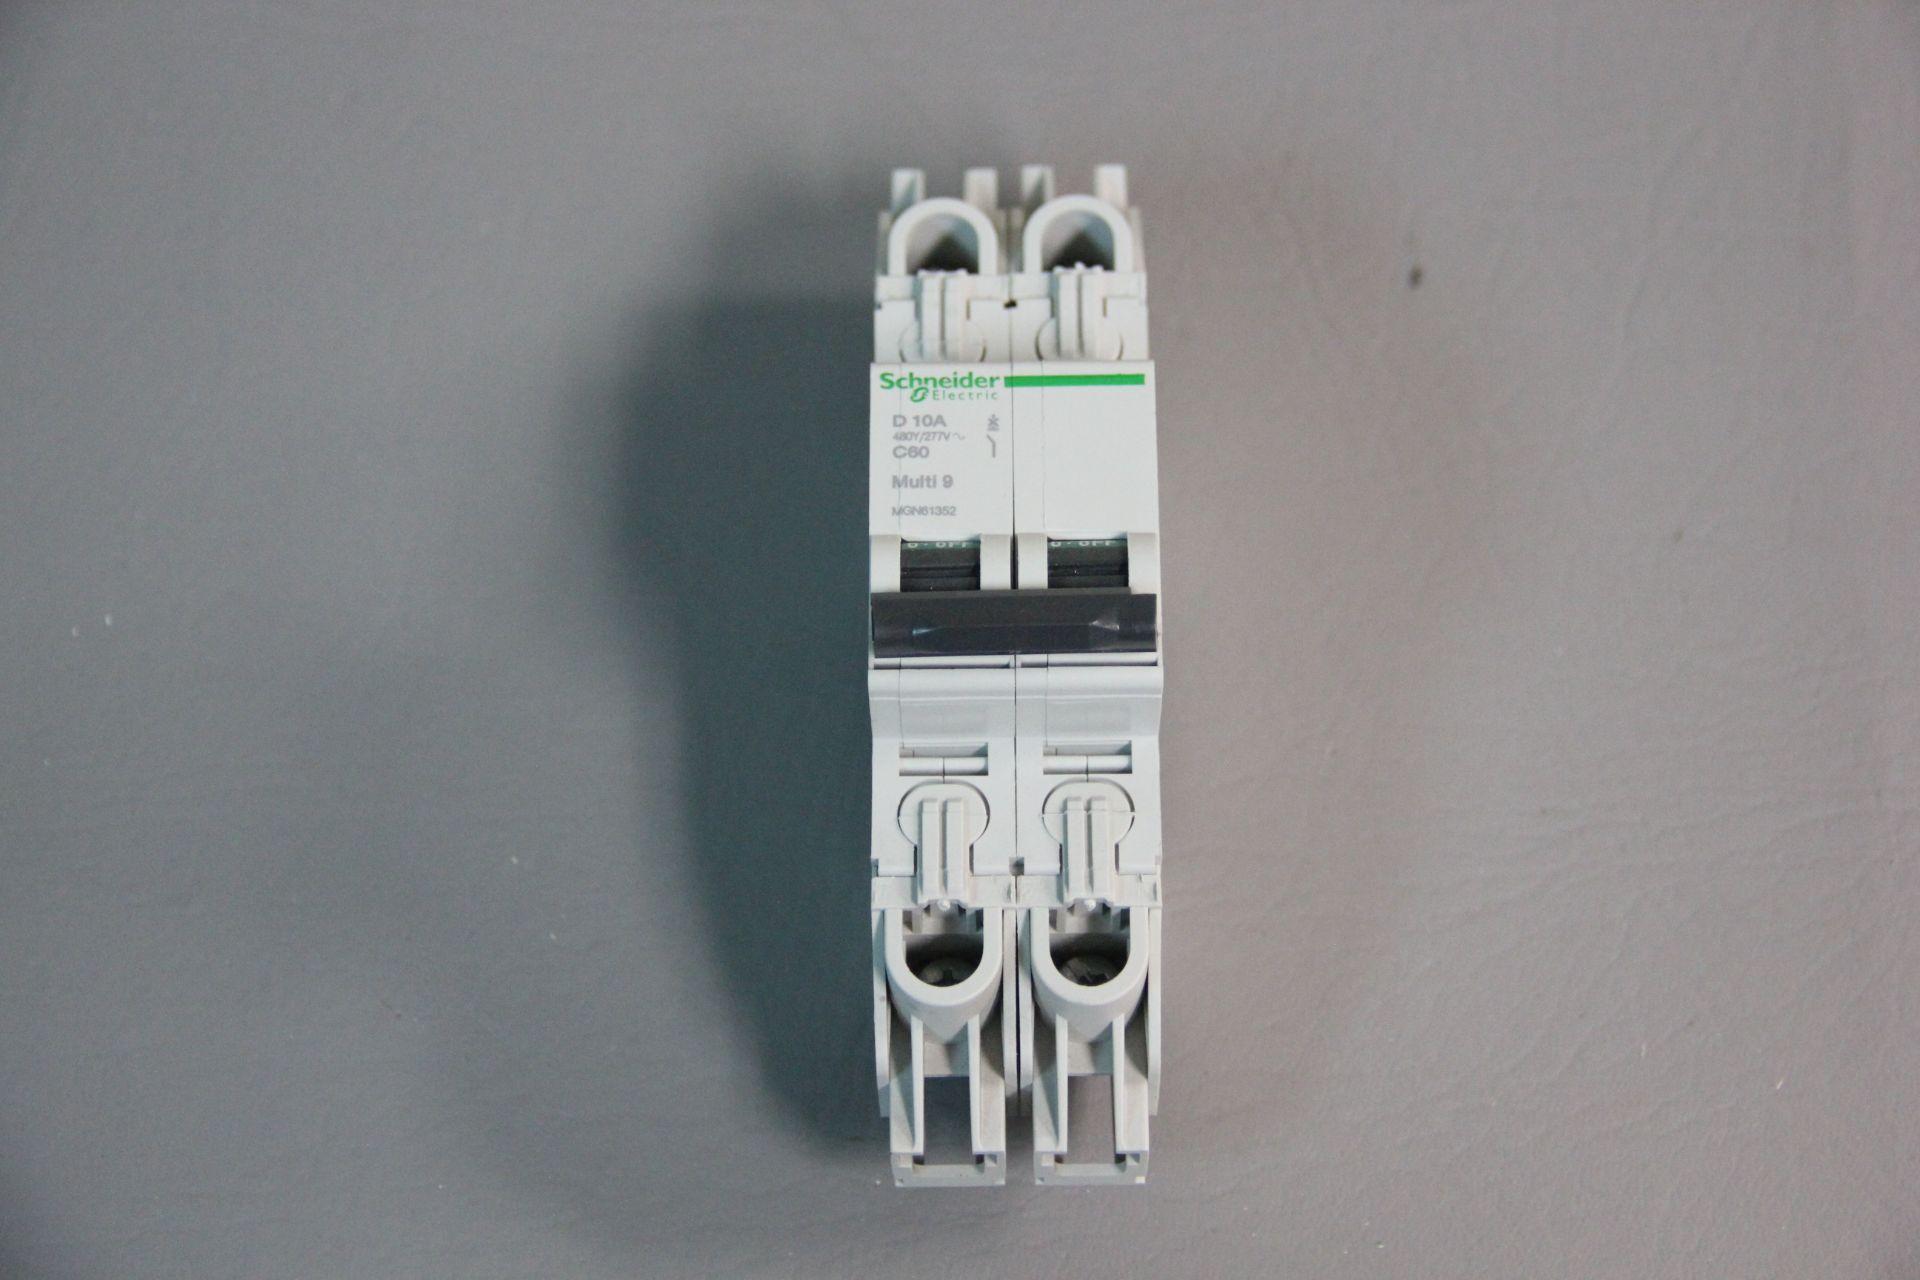 NEW SCHNEIDER MULTI 9 CIRCUIT BREAKER - Image 3 of 4